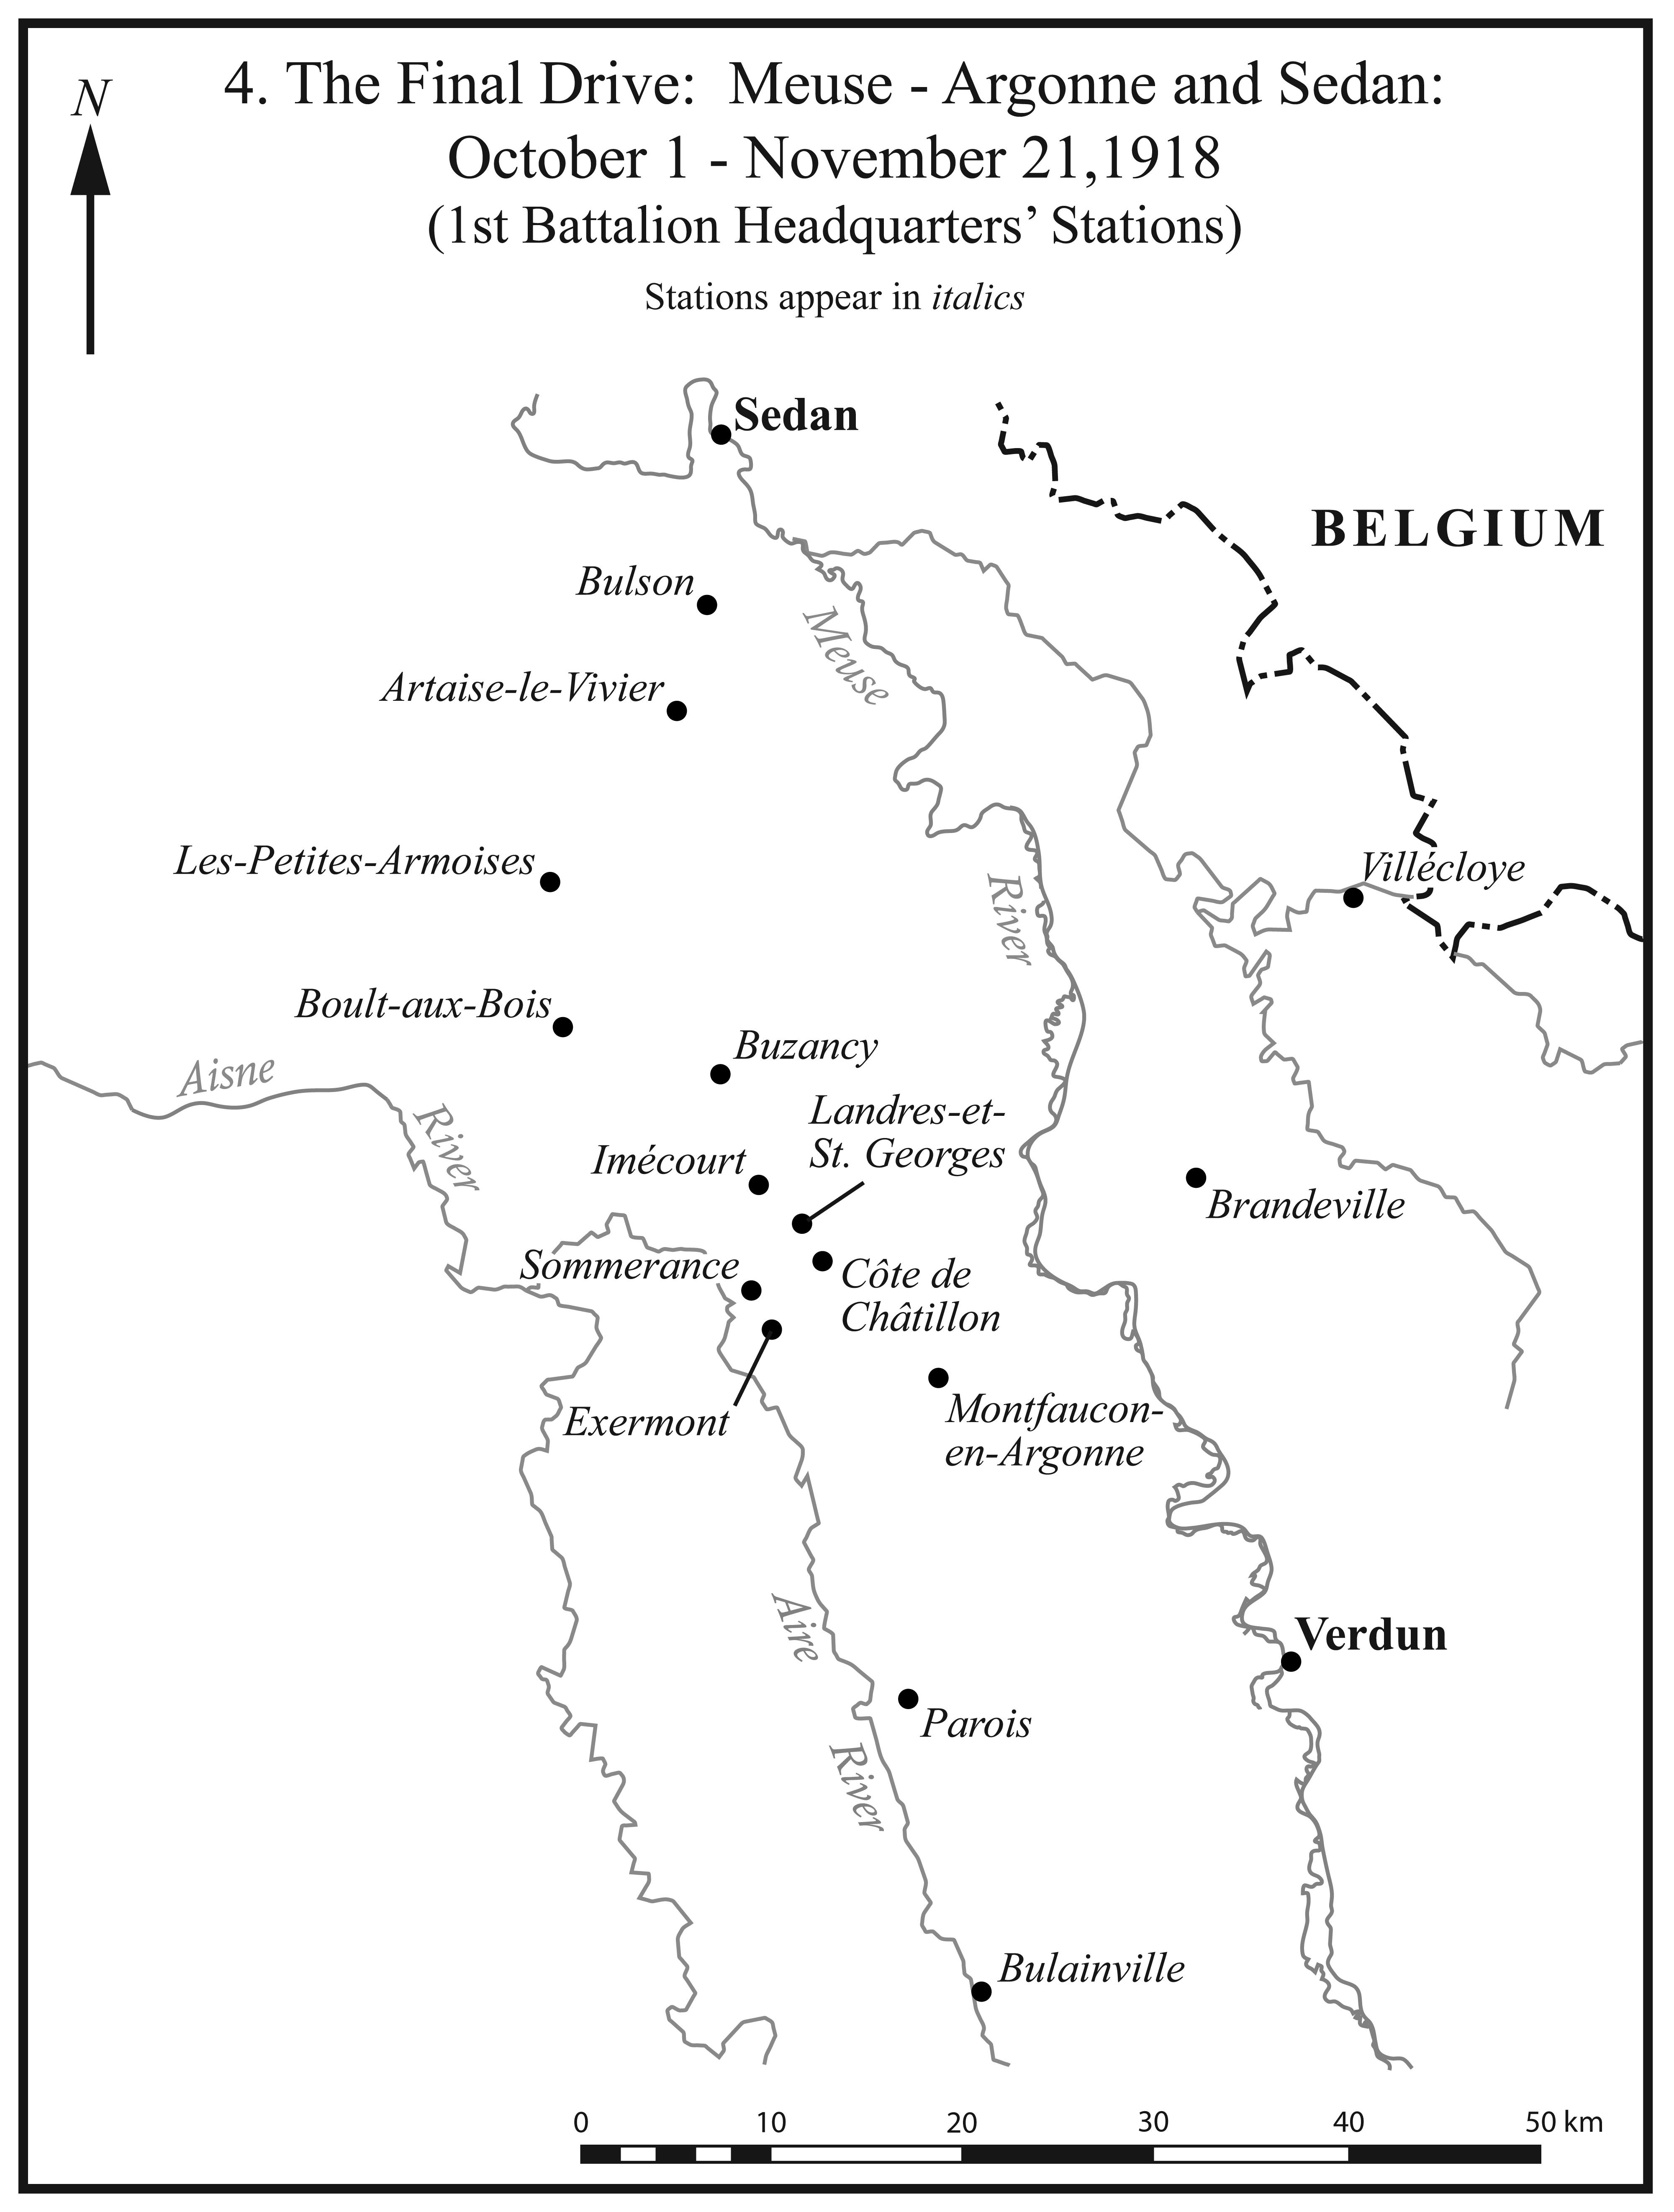 I.4. Meuse-Argonne and Sedan Stations.